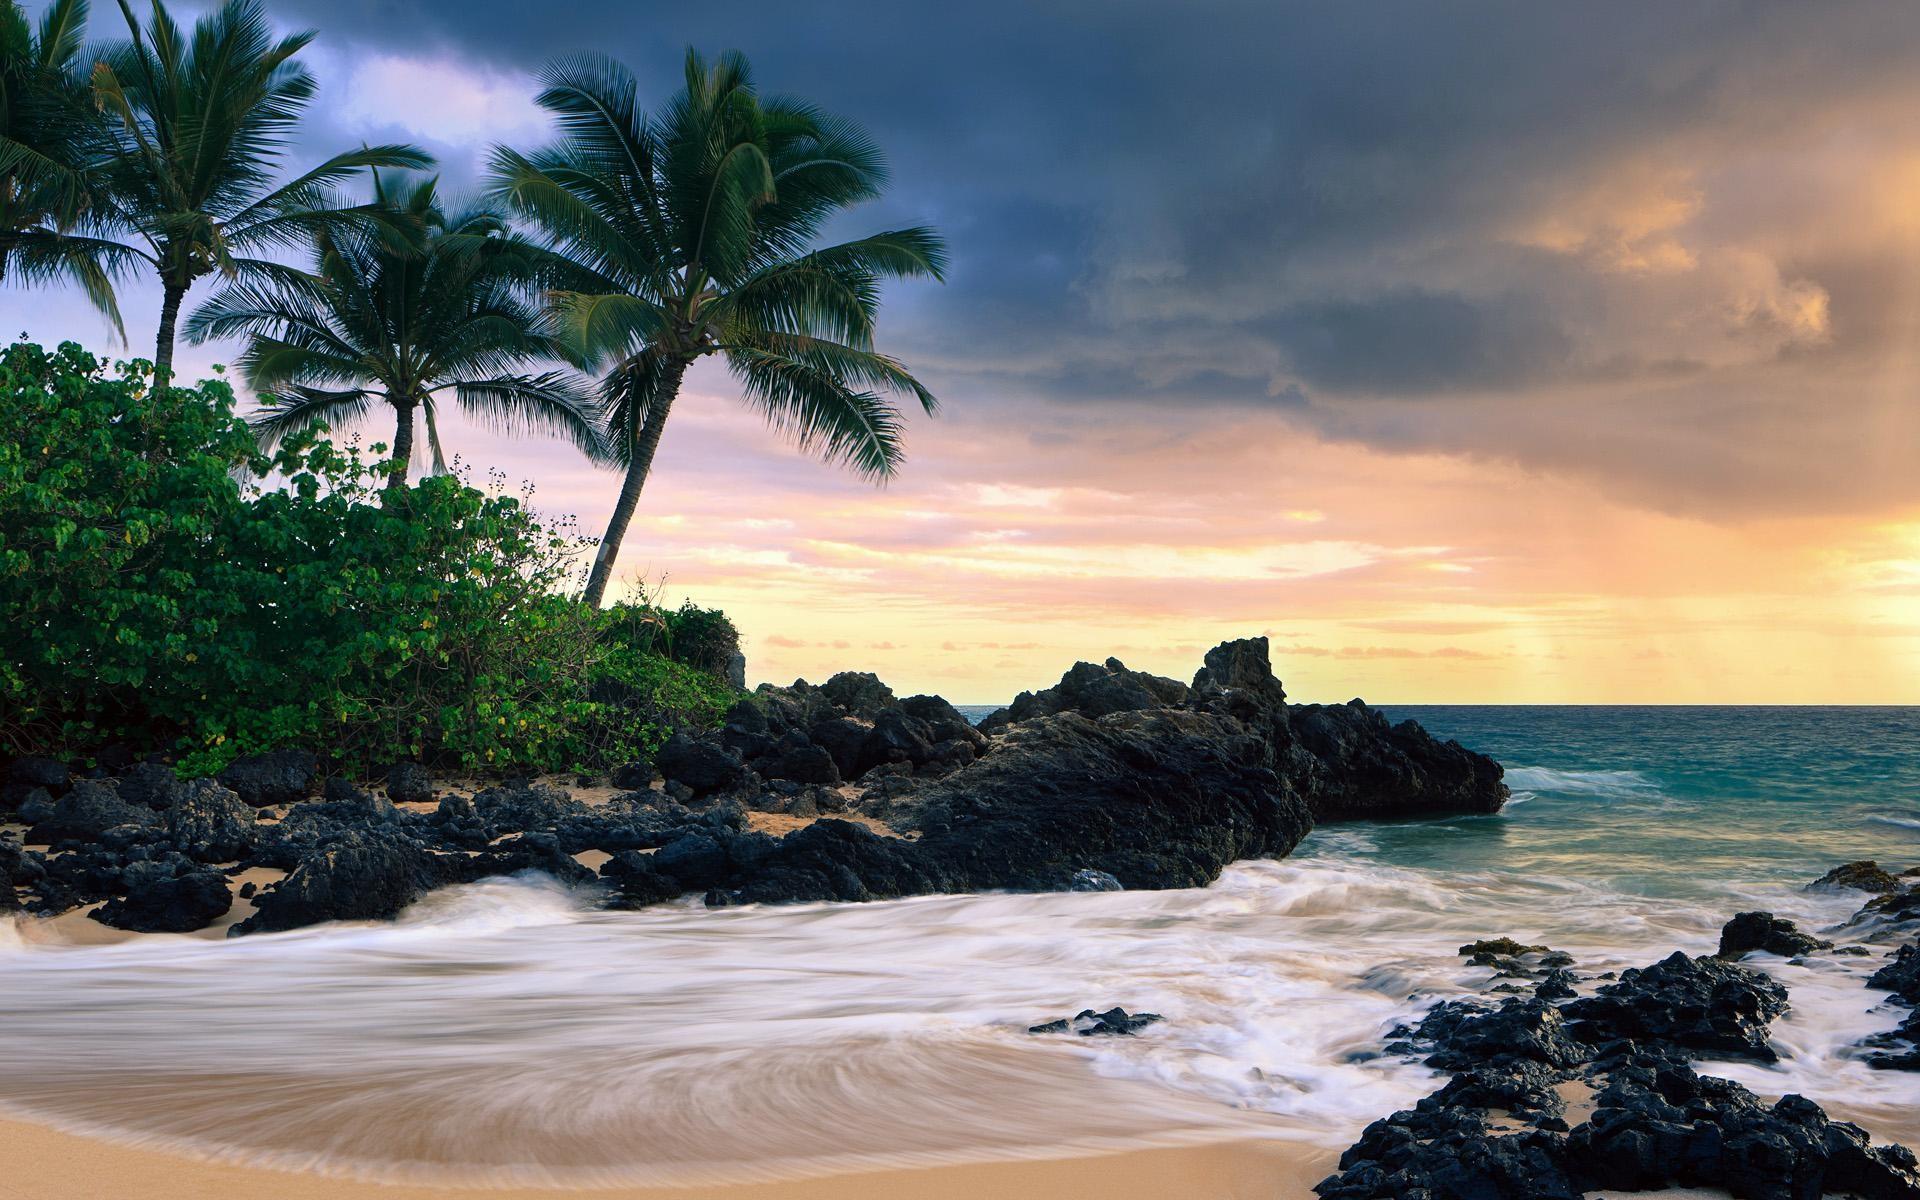 Hawaii-Wallpapers-HD-Free-Download